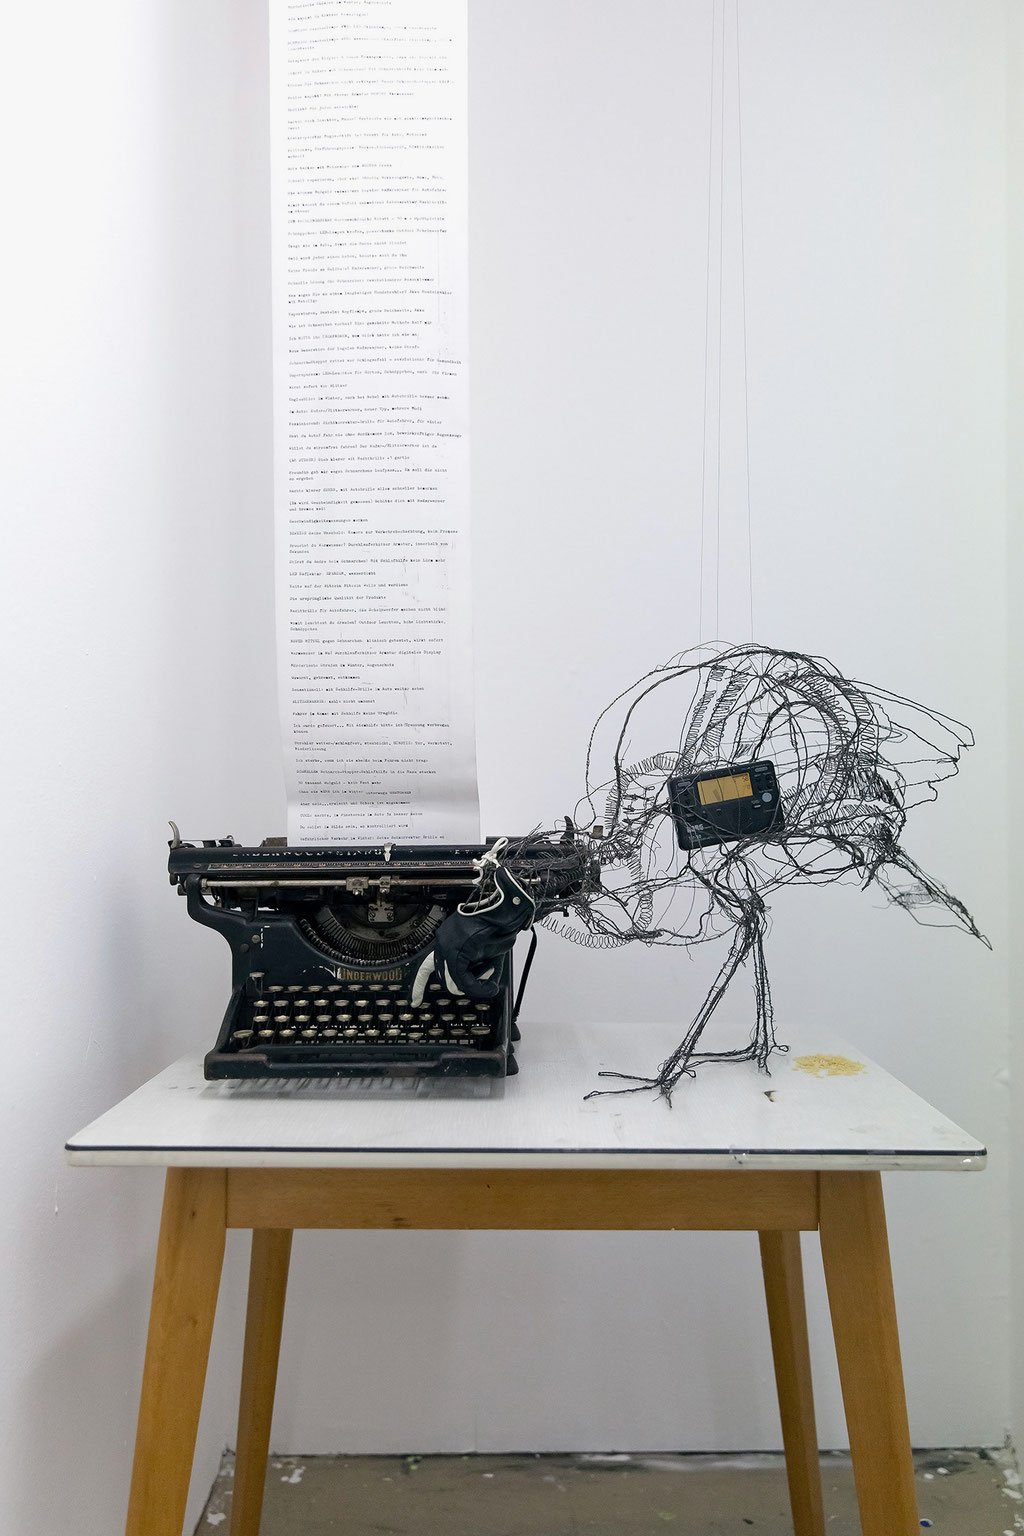 Angehaltener Spamautomat, 2018, Objekt / Installation.